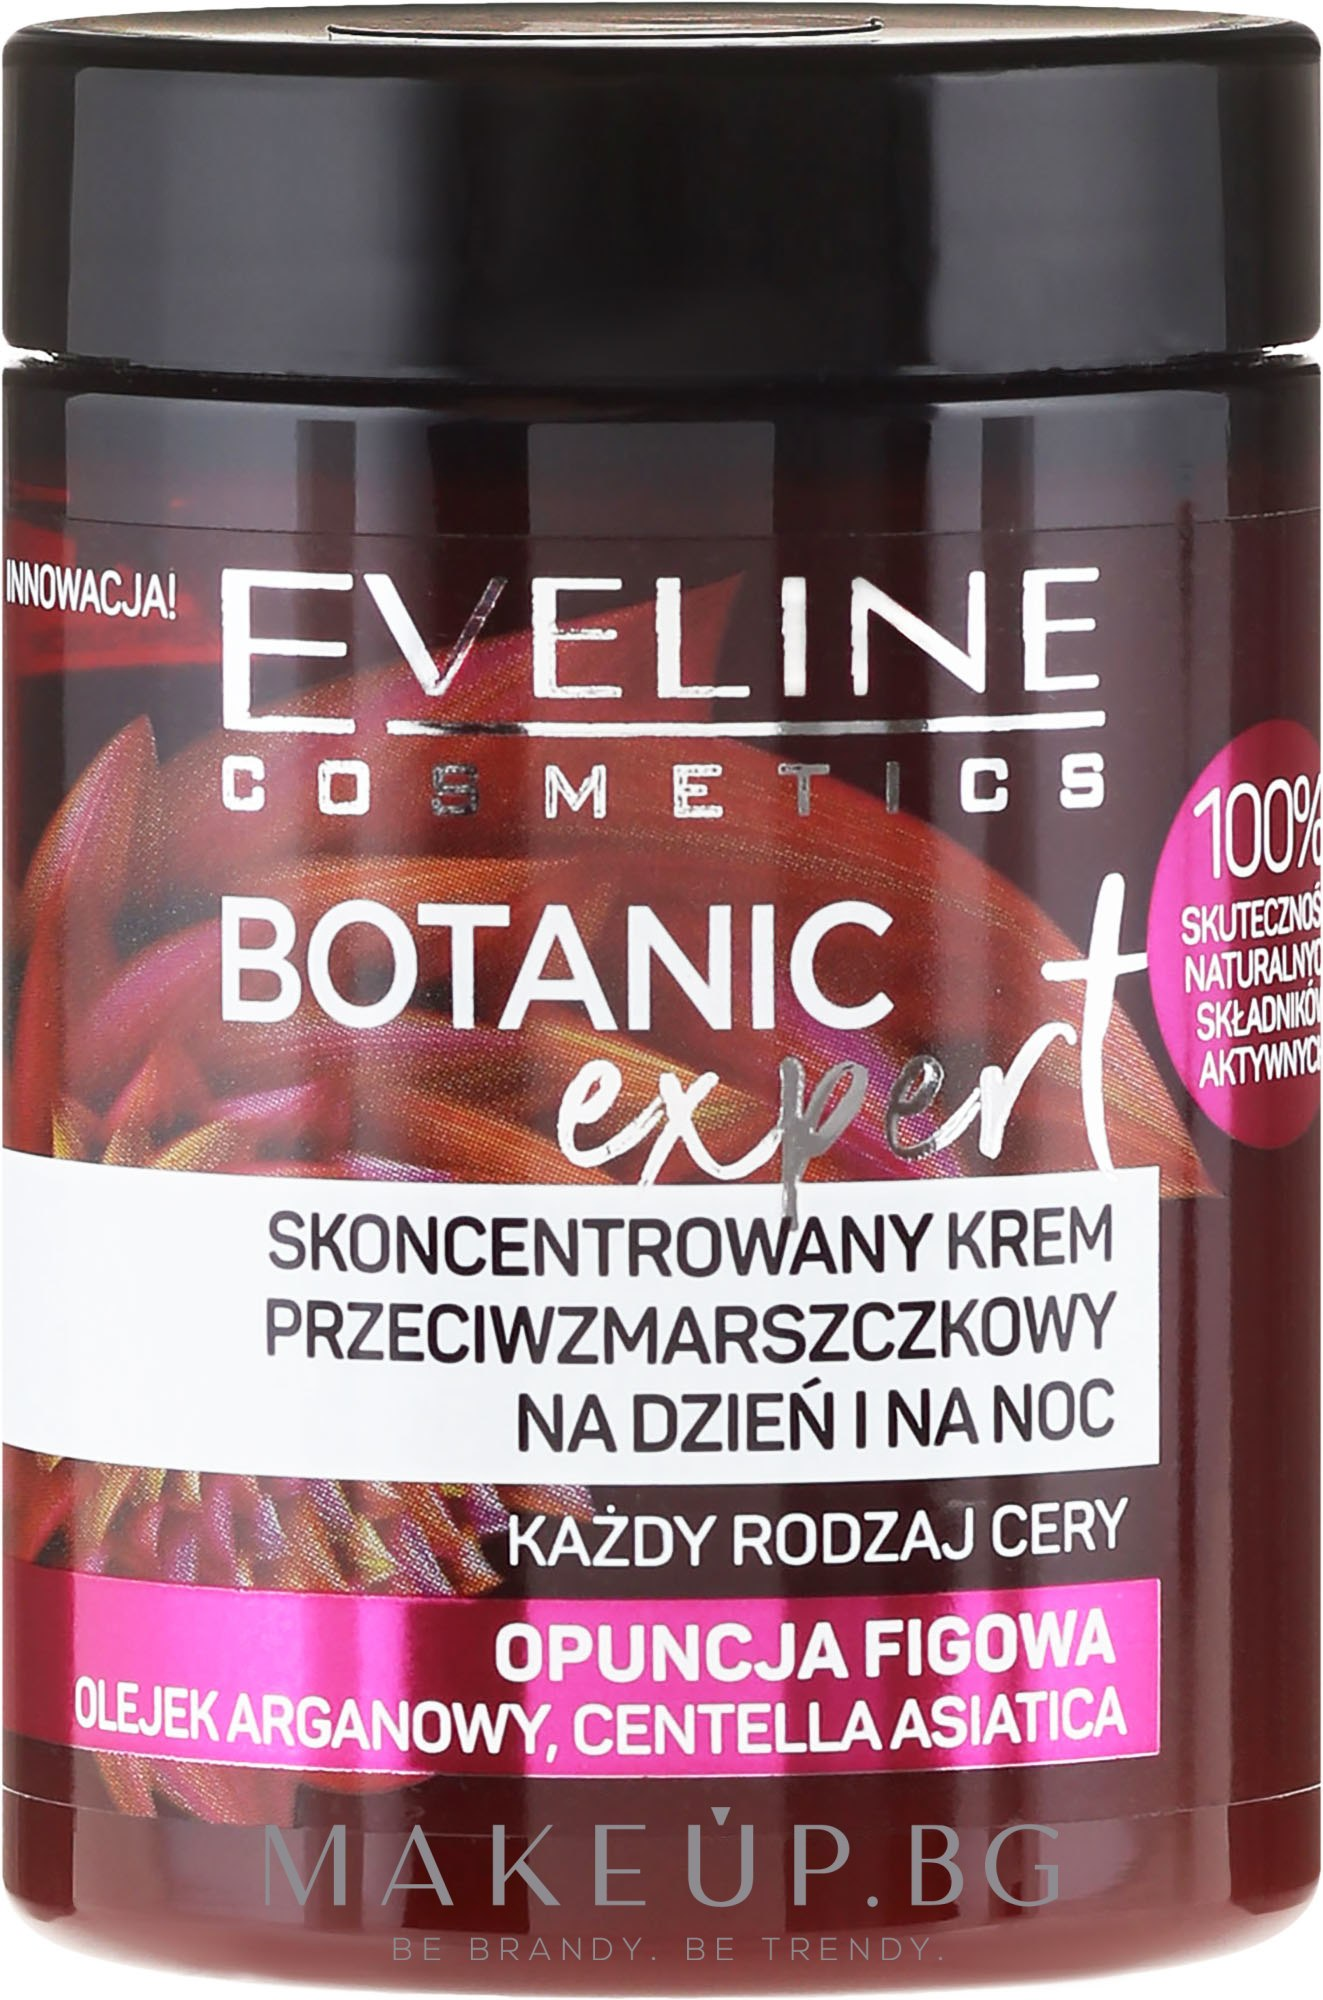 Концентриран крем против бръчки - Eveline Cosmetics Botanic Expert Concentrated Anti-wrinkle Day & Night Cream — снимка 100 ml